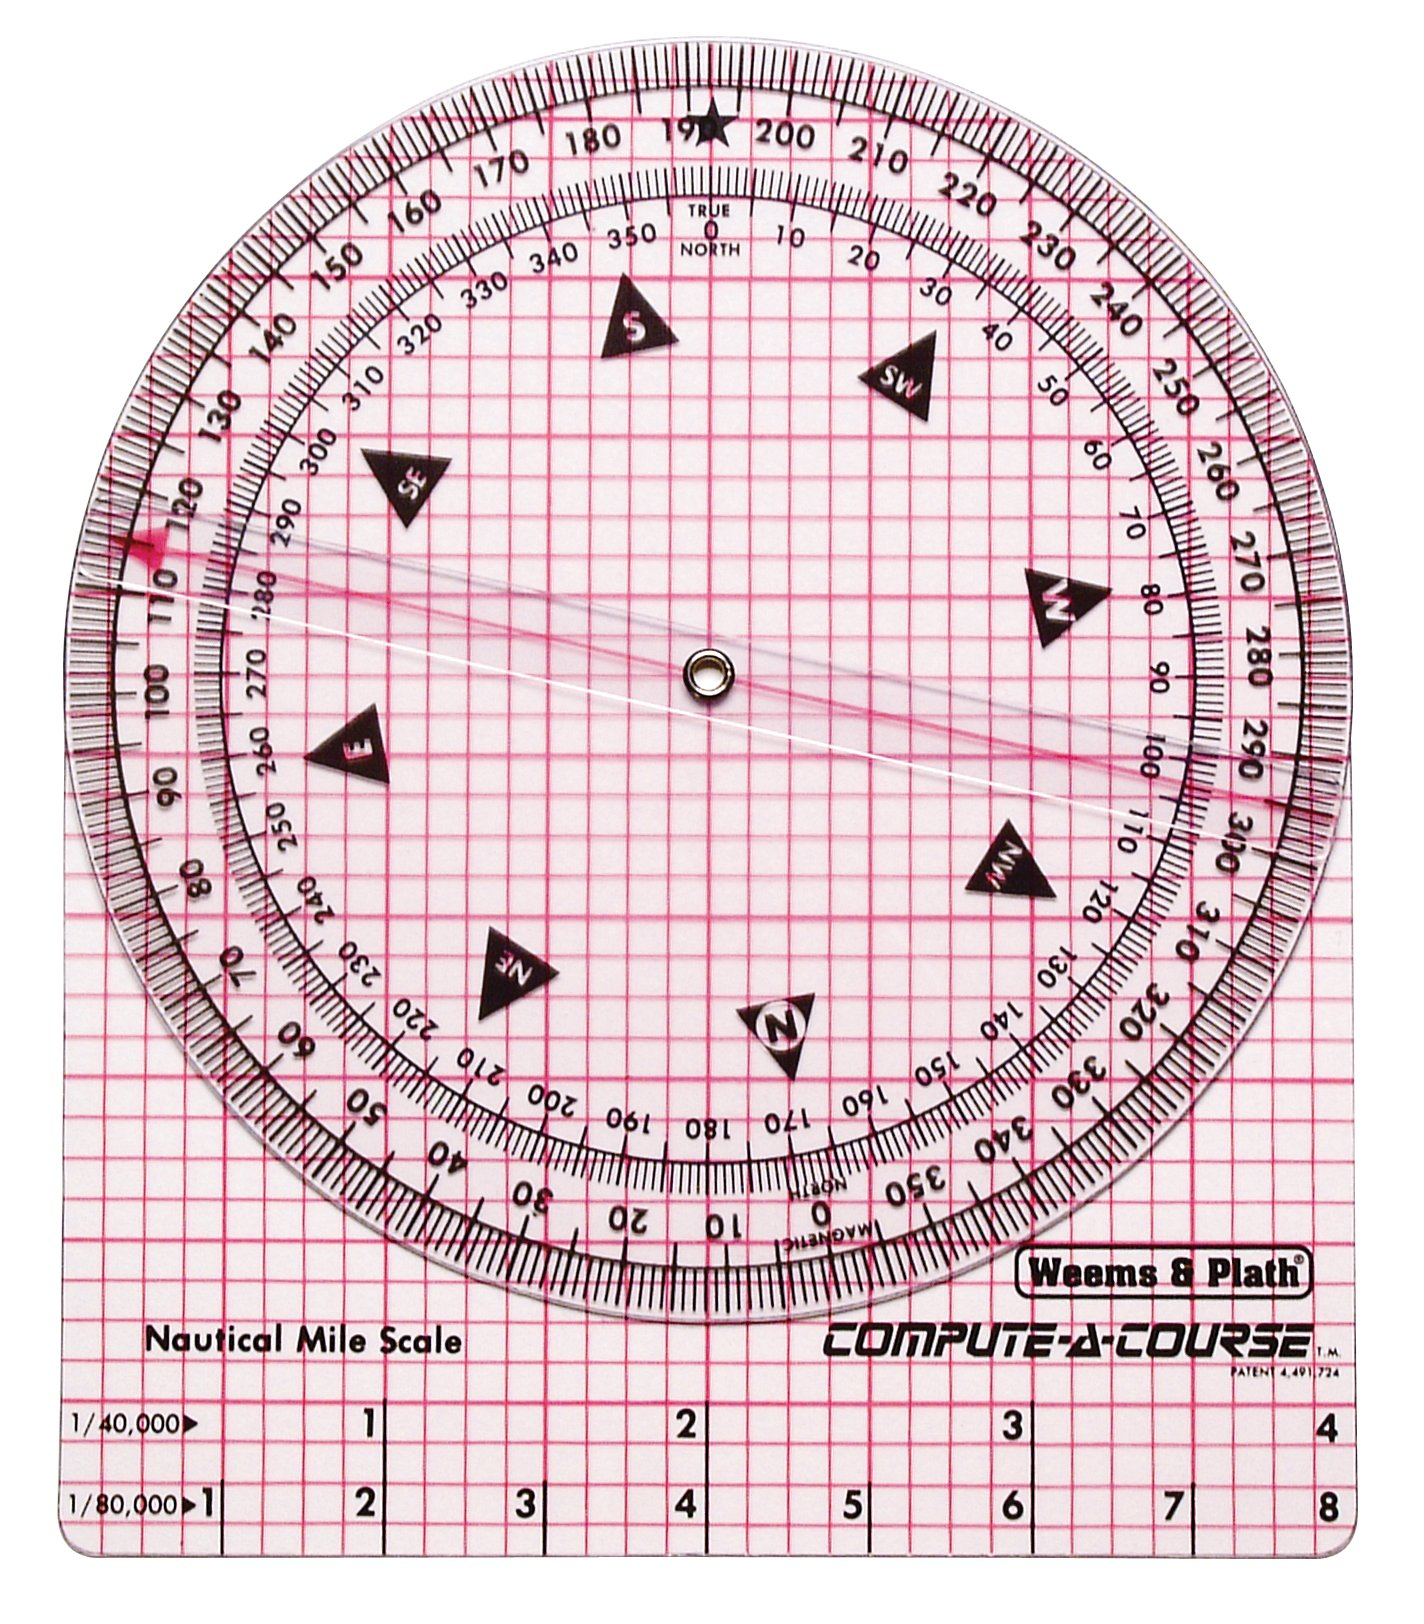 Weems & Plath Marine Navigation Compute-A-Course Multi-Purpose Plotting Tool